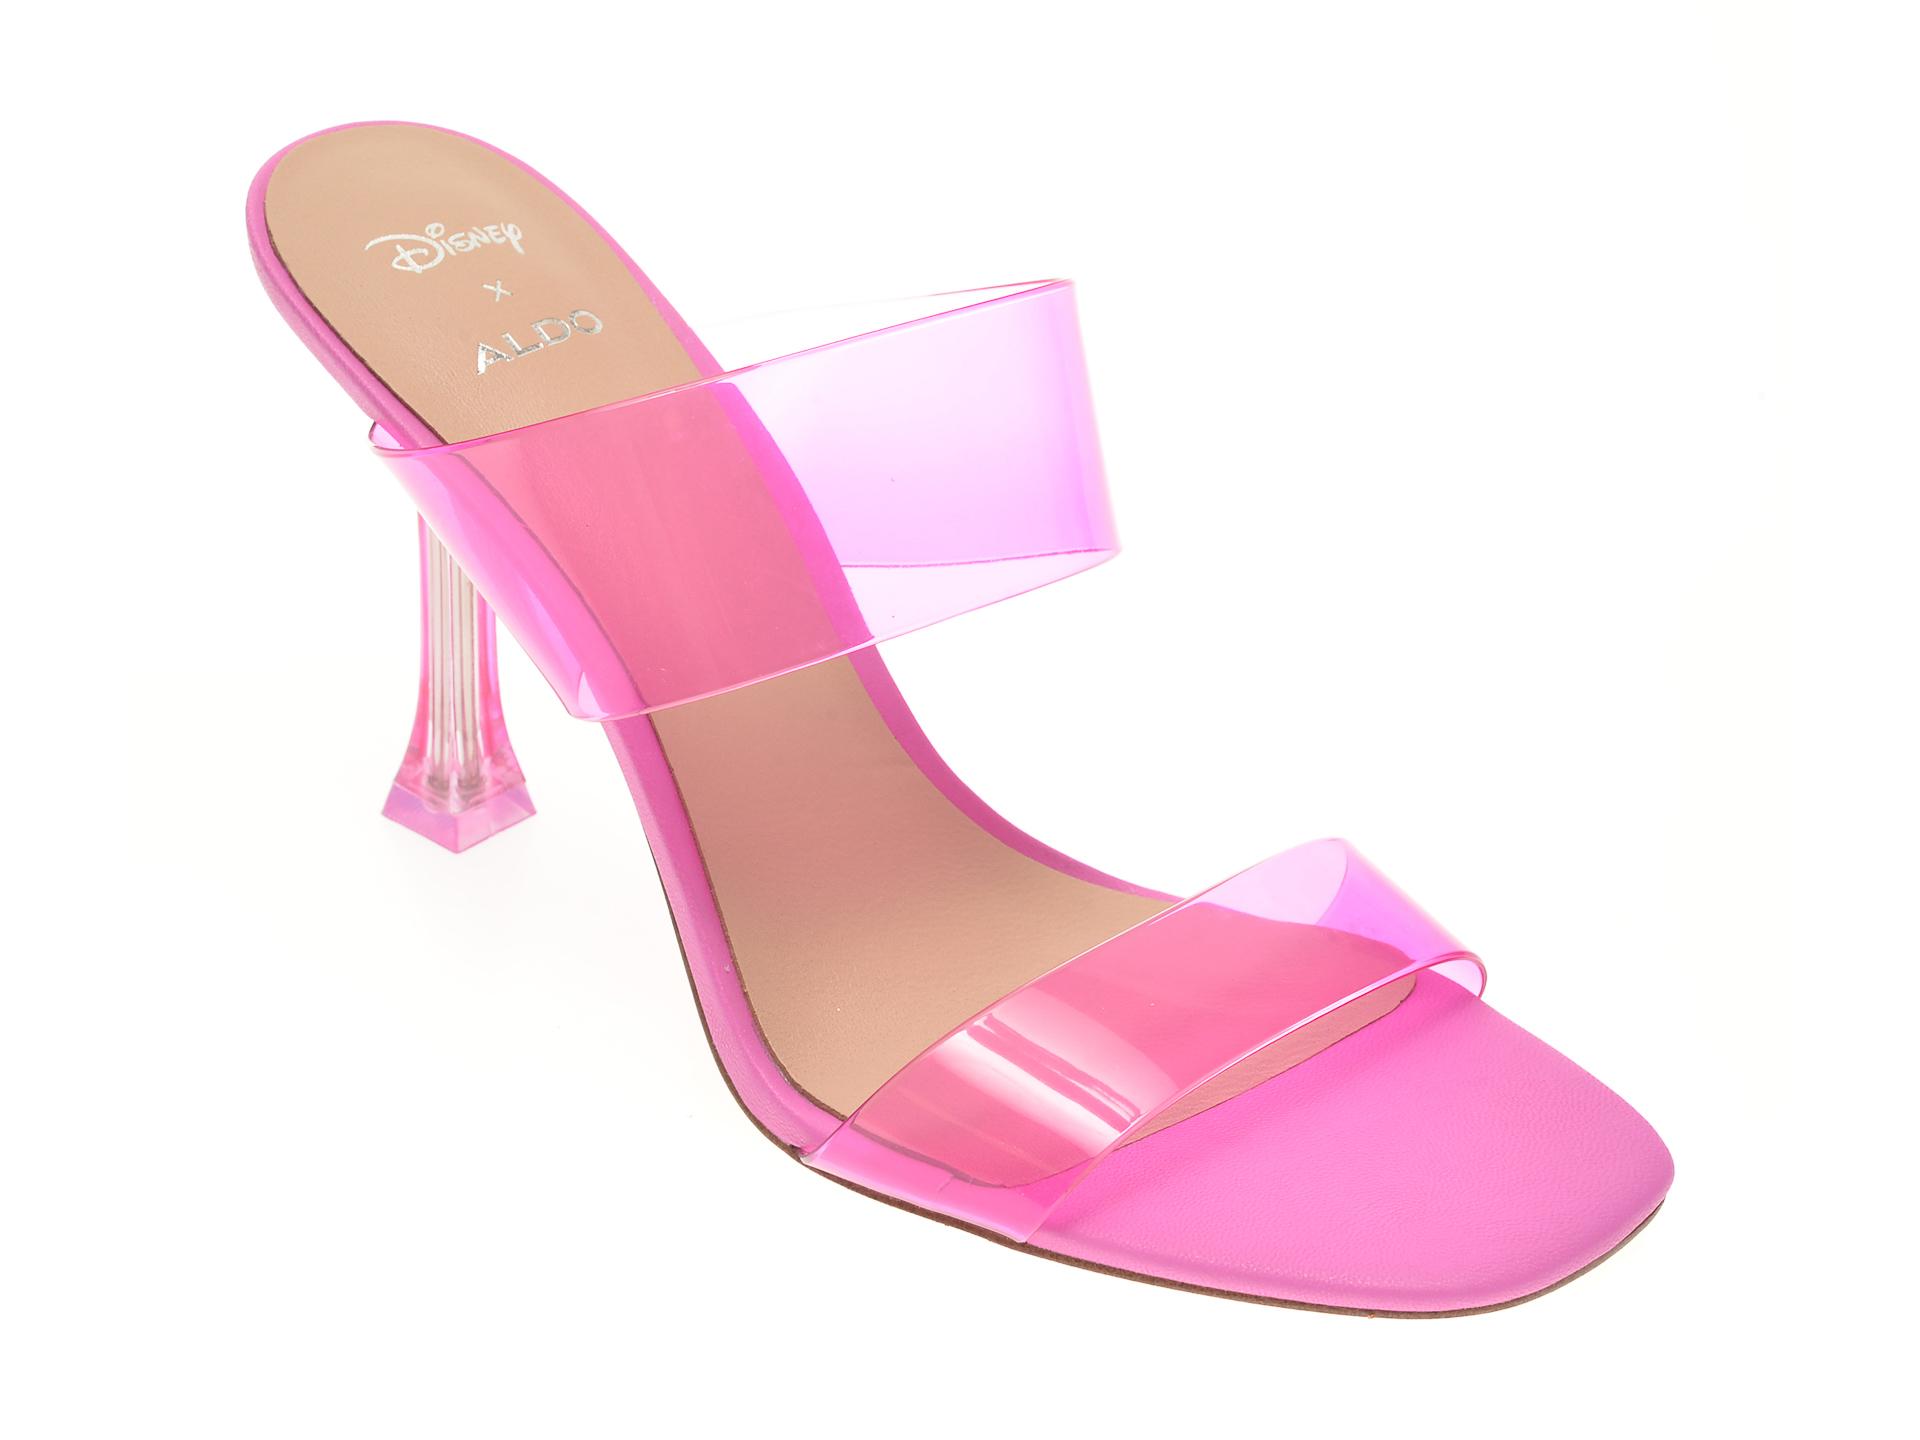 Sandale ALDO roz, Stepsisters650, din pvc imagine otter.ro 2021